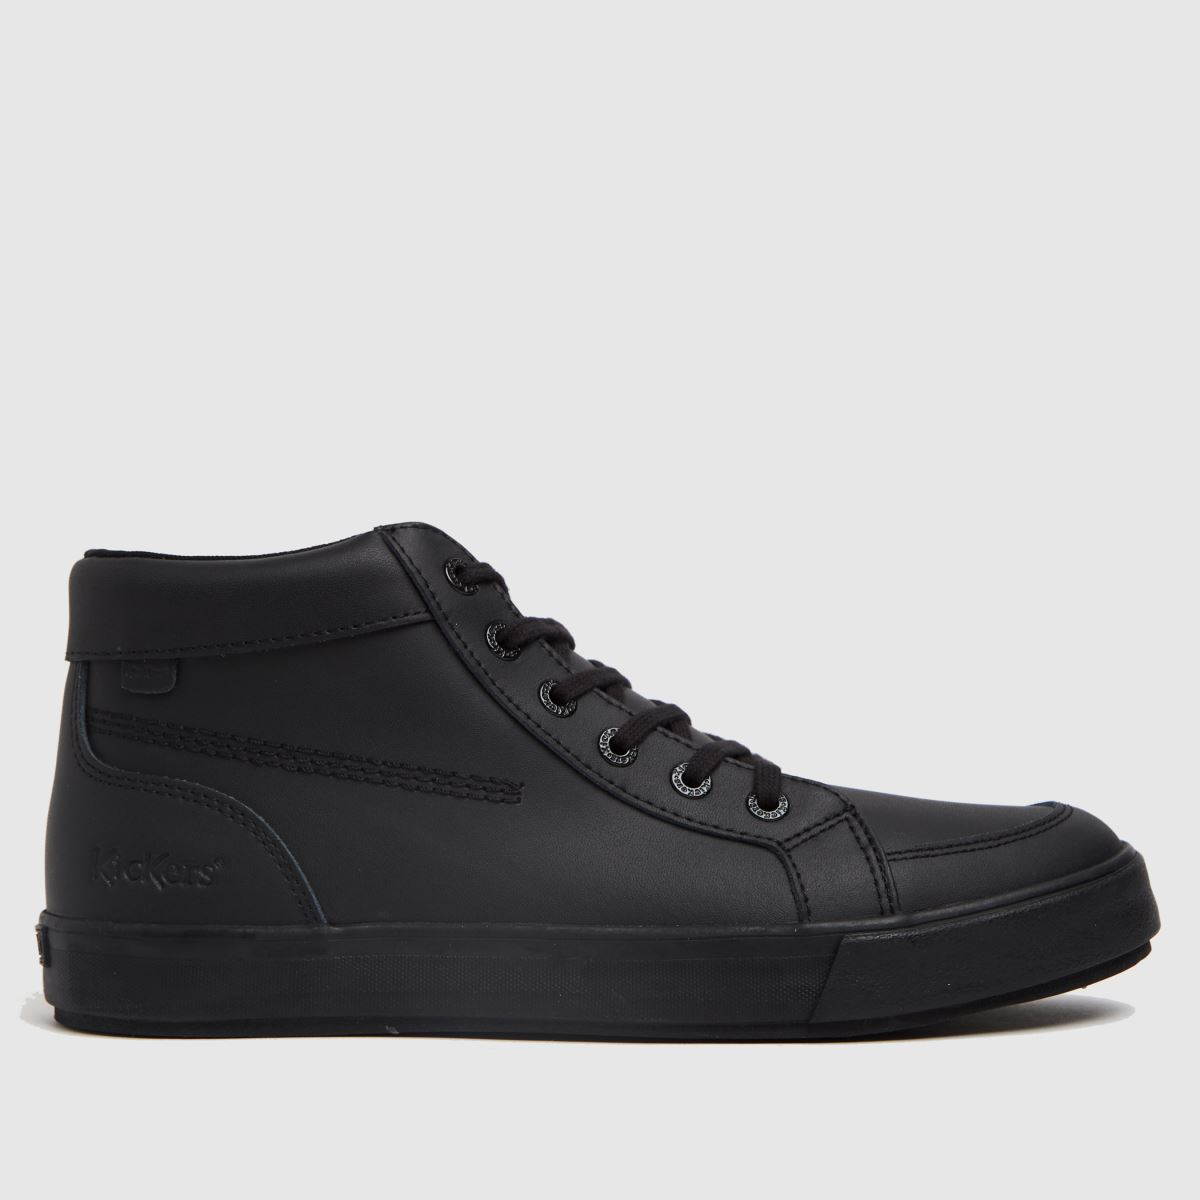 Kickers Black Tovni Hi Mono Shoes